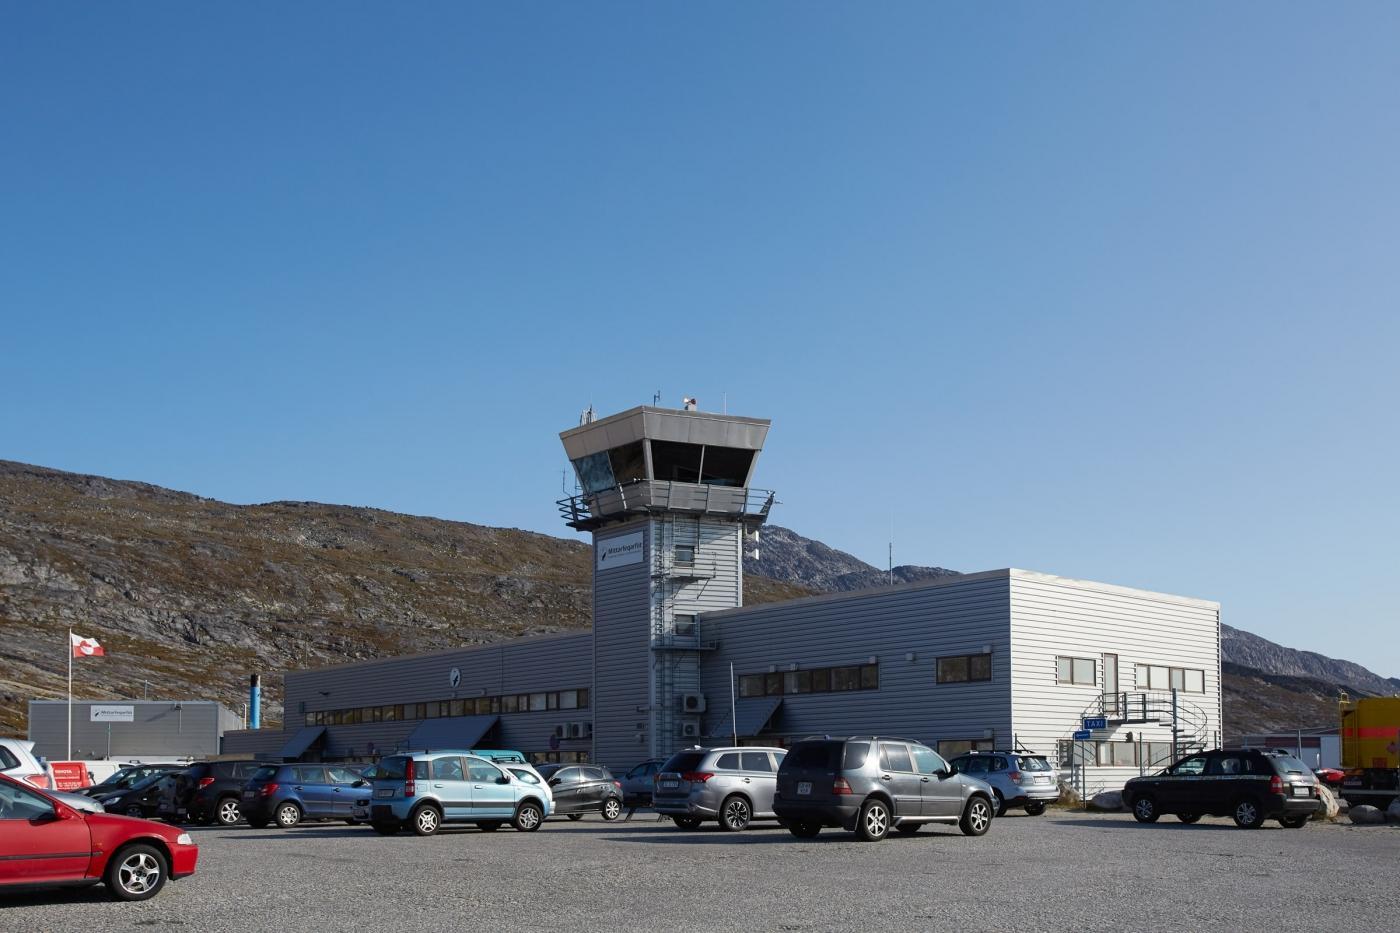 Airoprt Nuuk - Peter Lindstrom - Visit Greenland